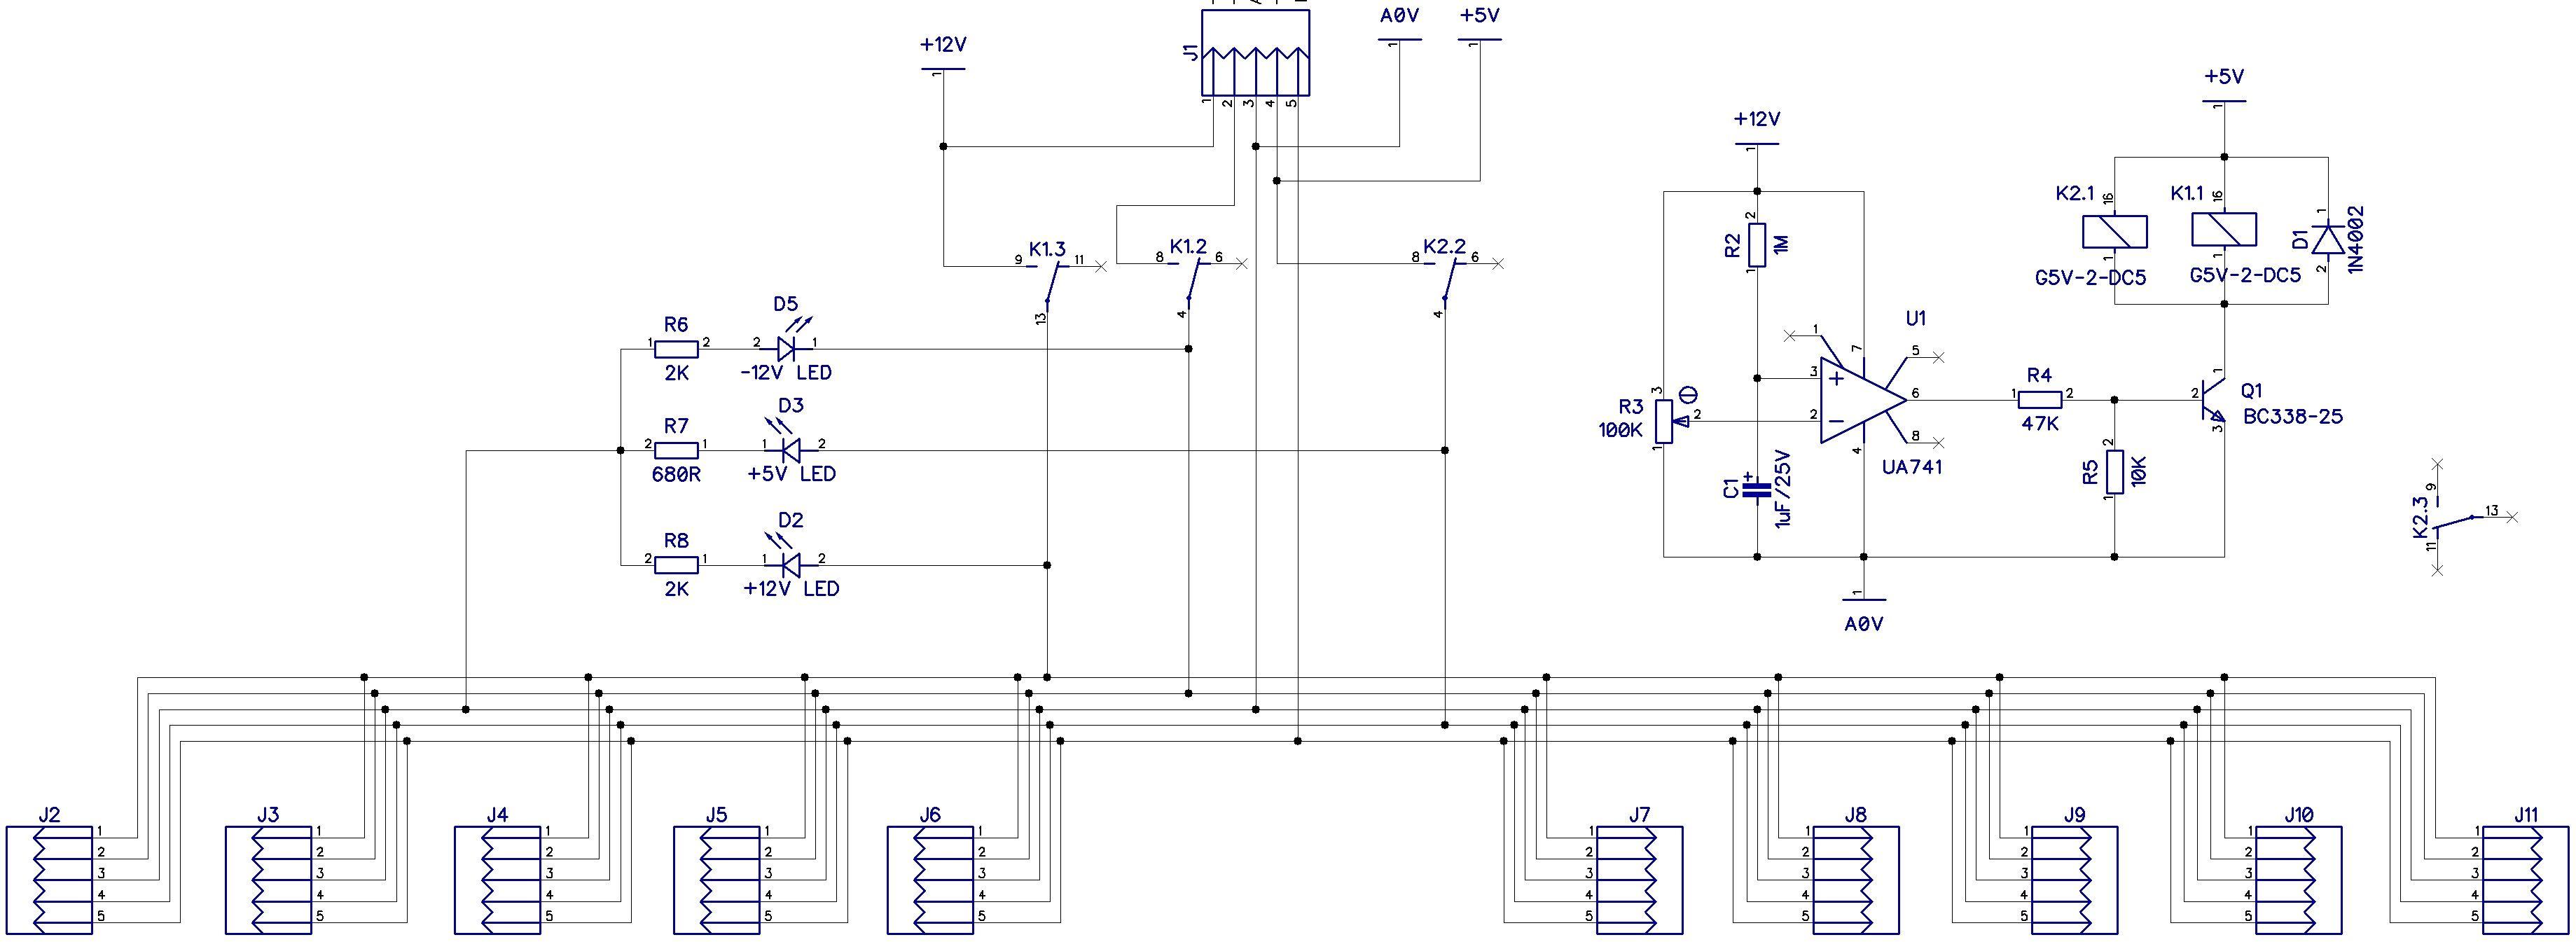 panel board schematic database wiring diagram panel board schematic panel board schematic [ 3678 x 1345 Pixel ]